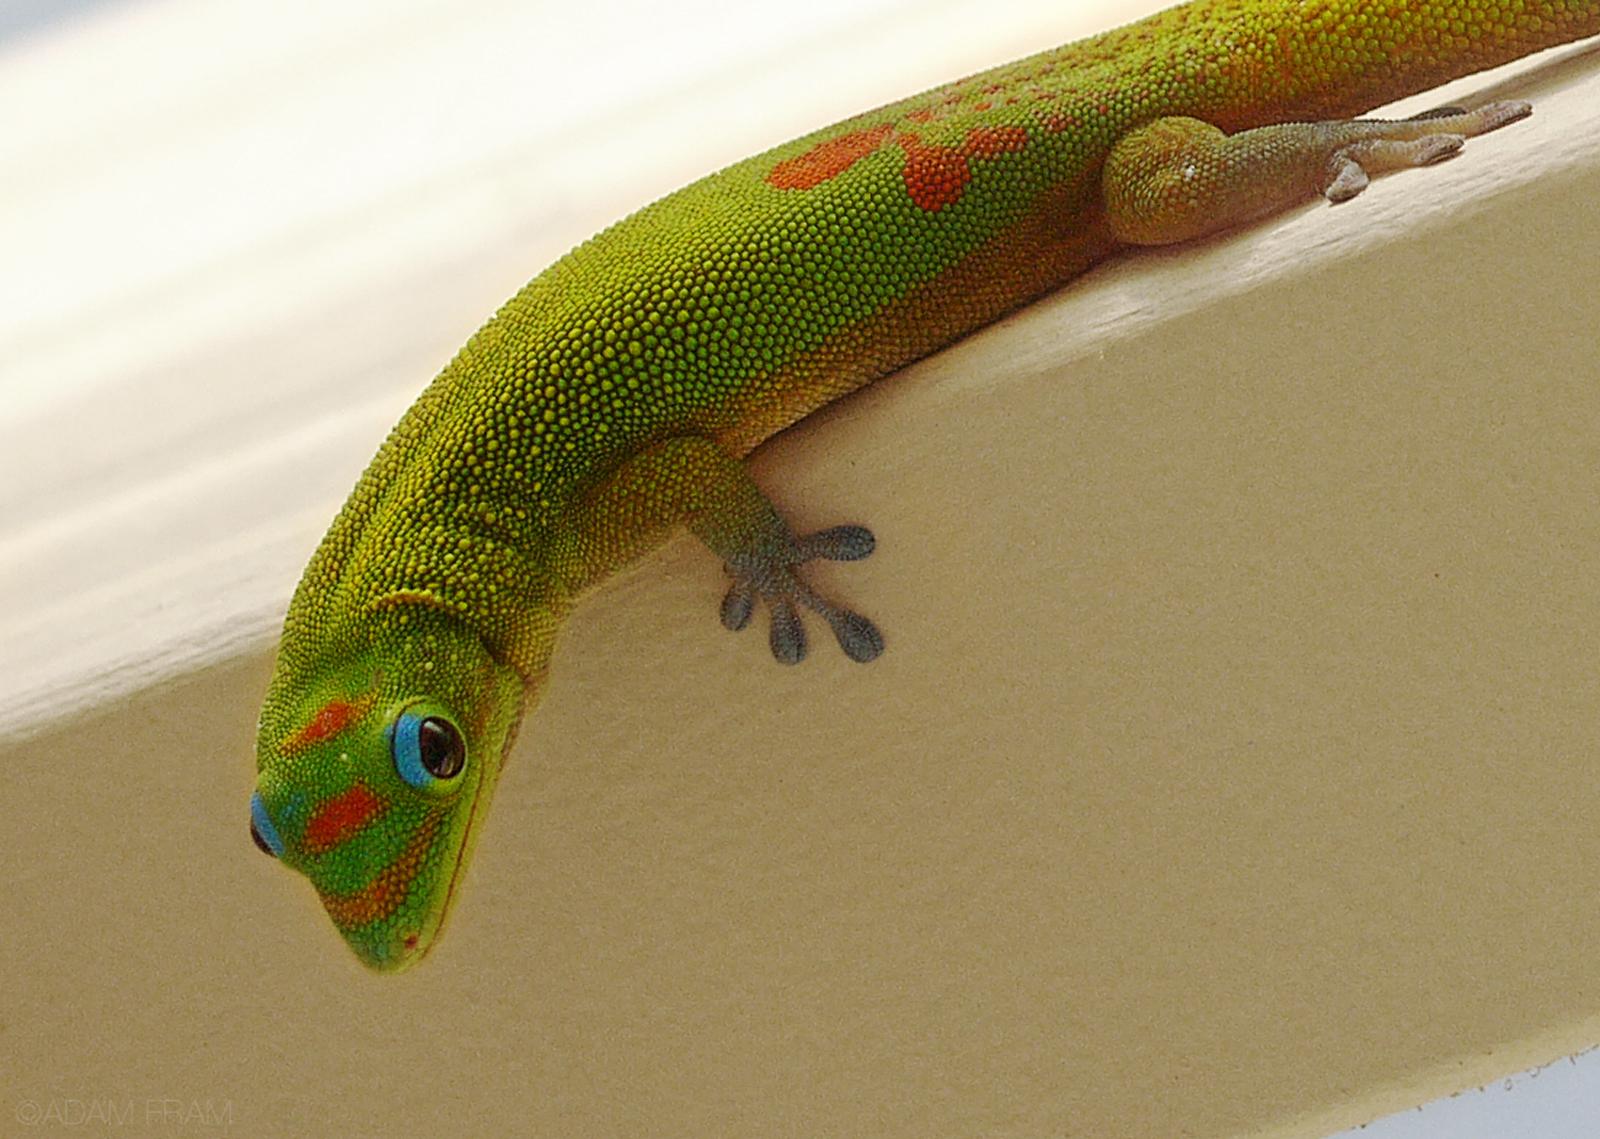 Gecko_Cropped.jpg